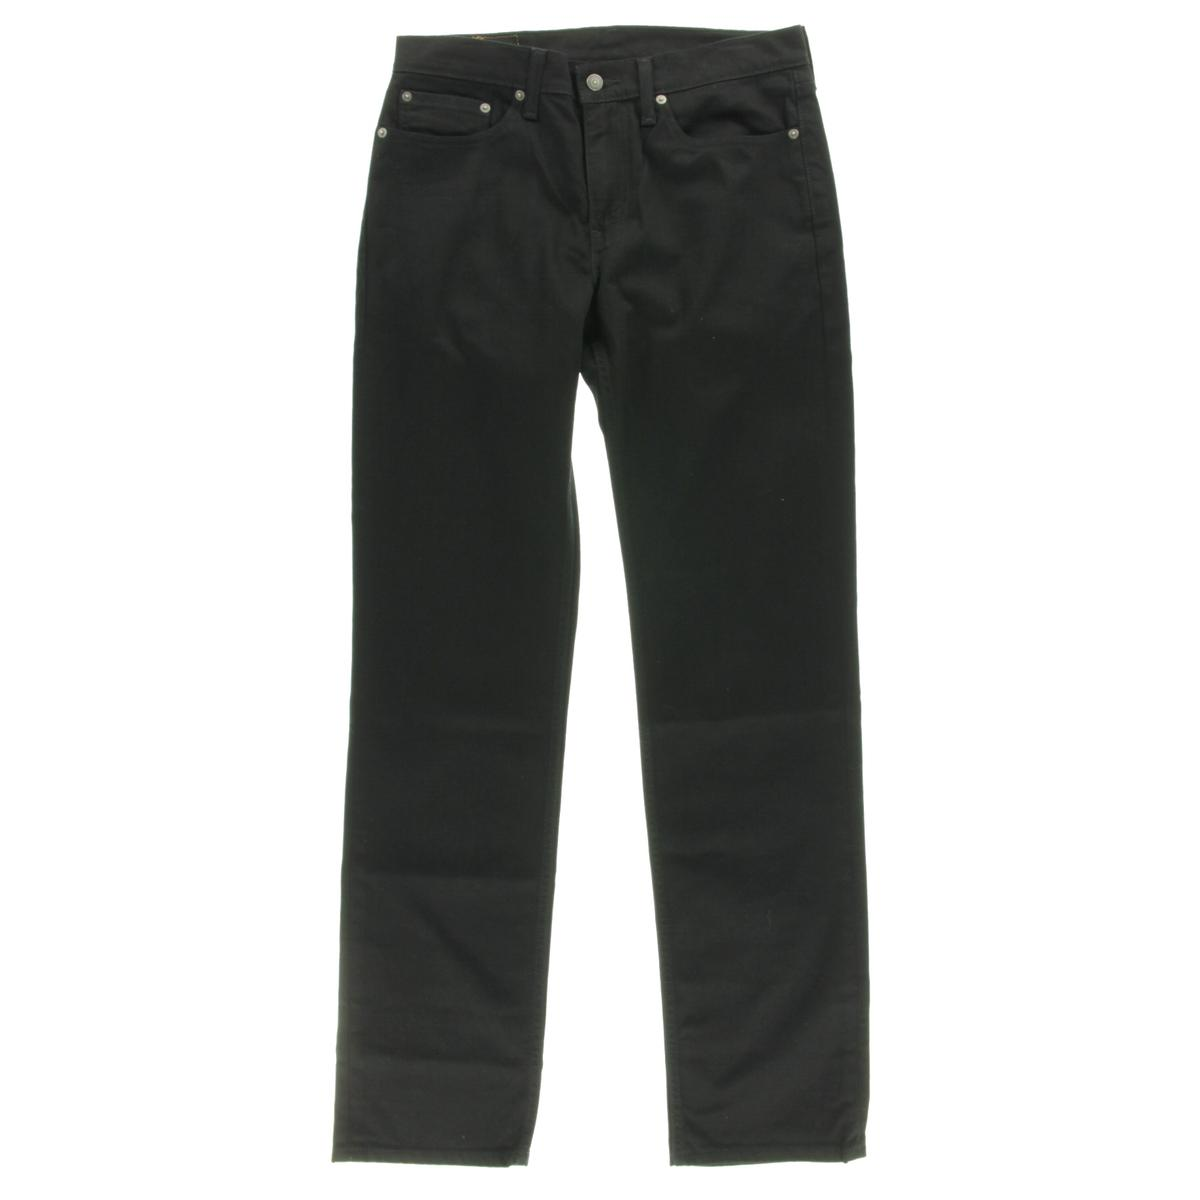 Levi's Mens 514 Denim Regular Fit Straight Leg Jeans